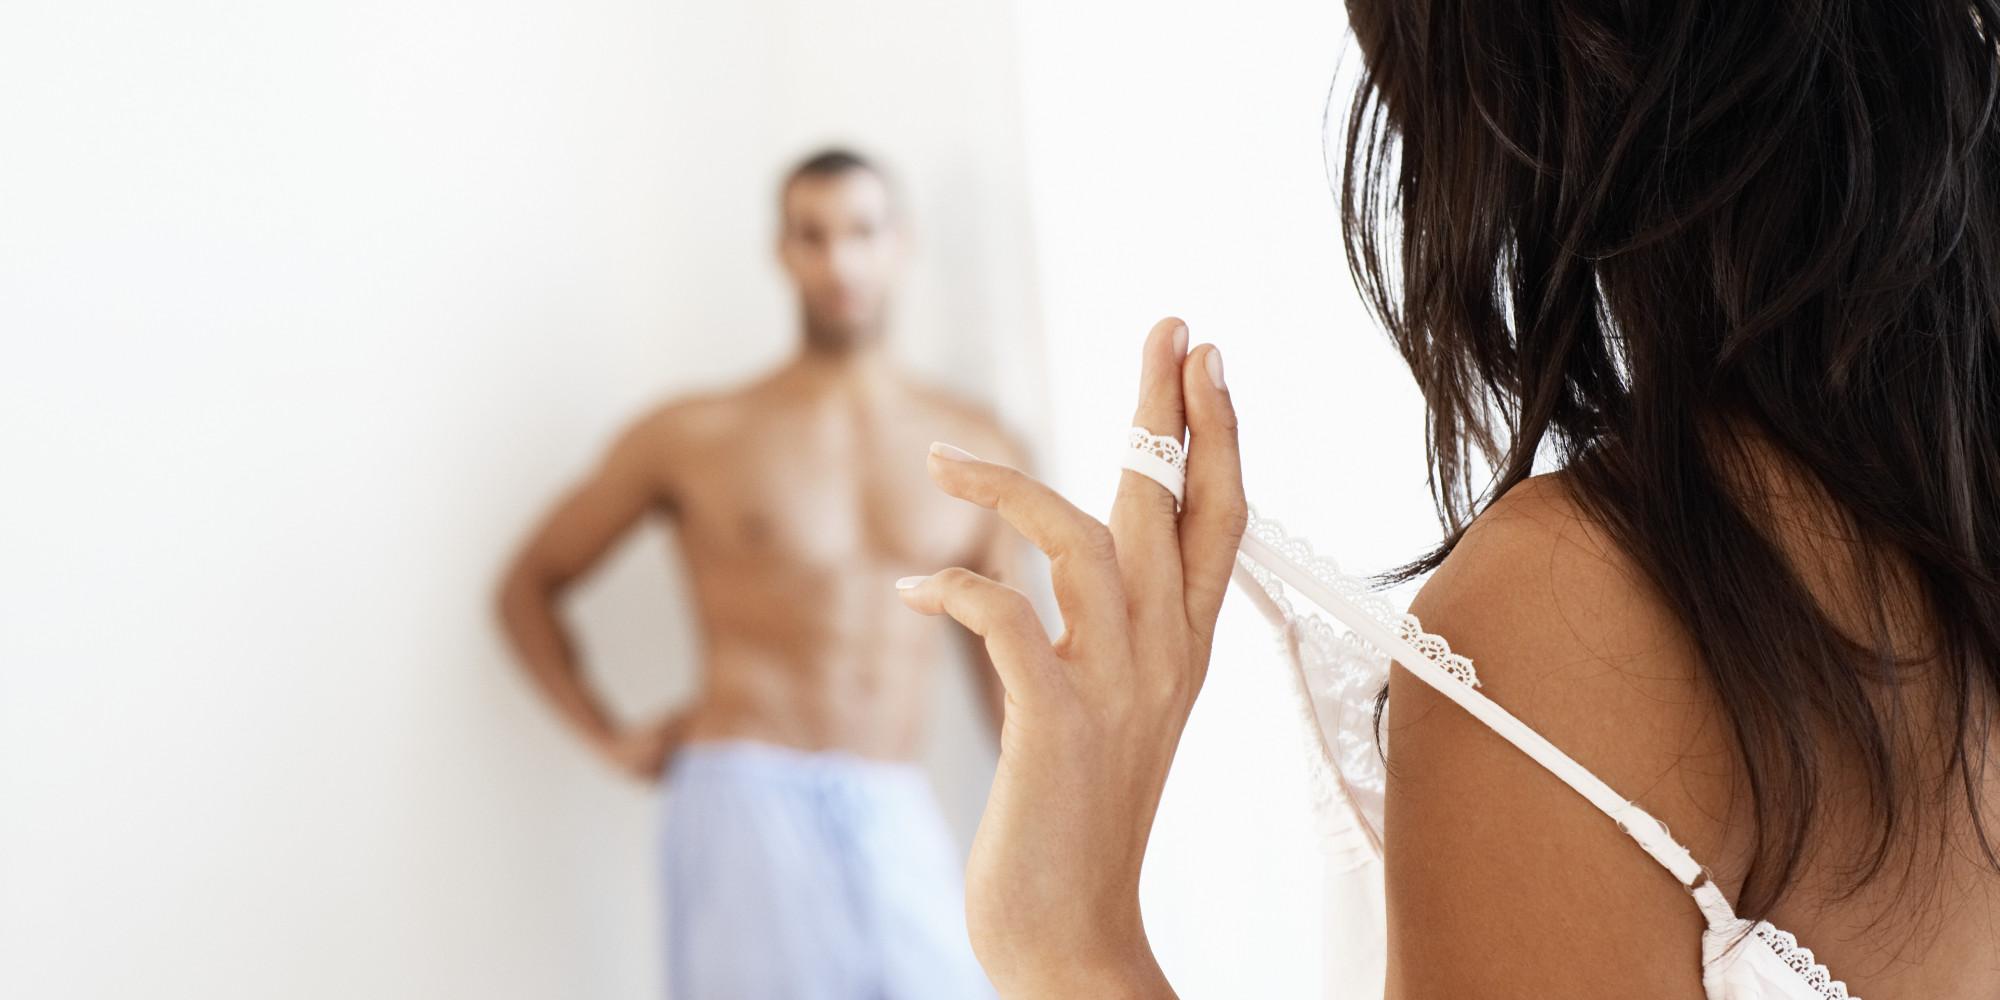 Cmo saber si su pareja es adicta al sexo Zen seccin